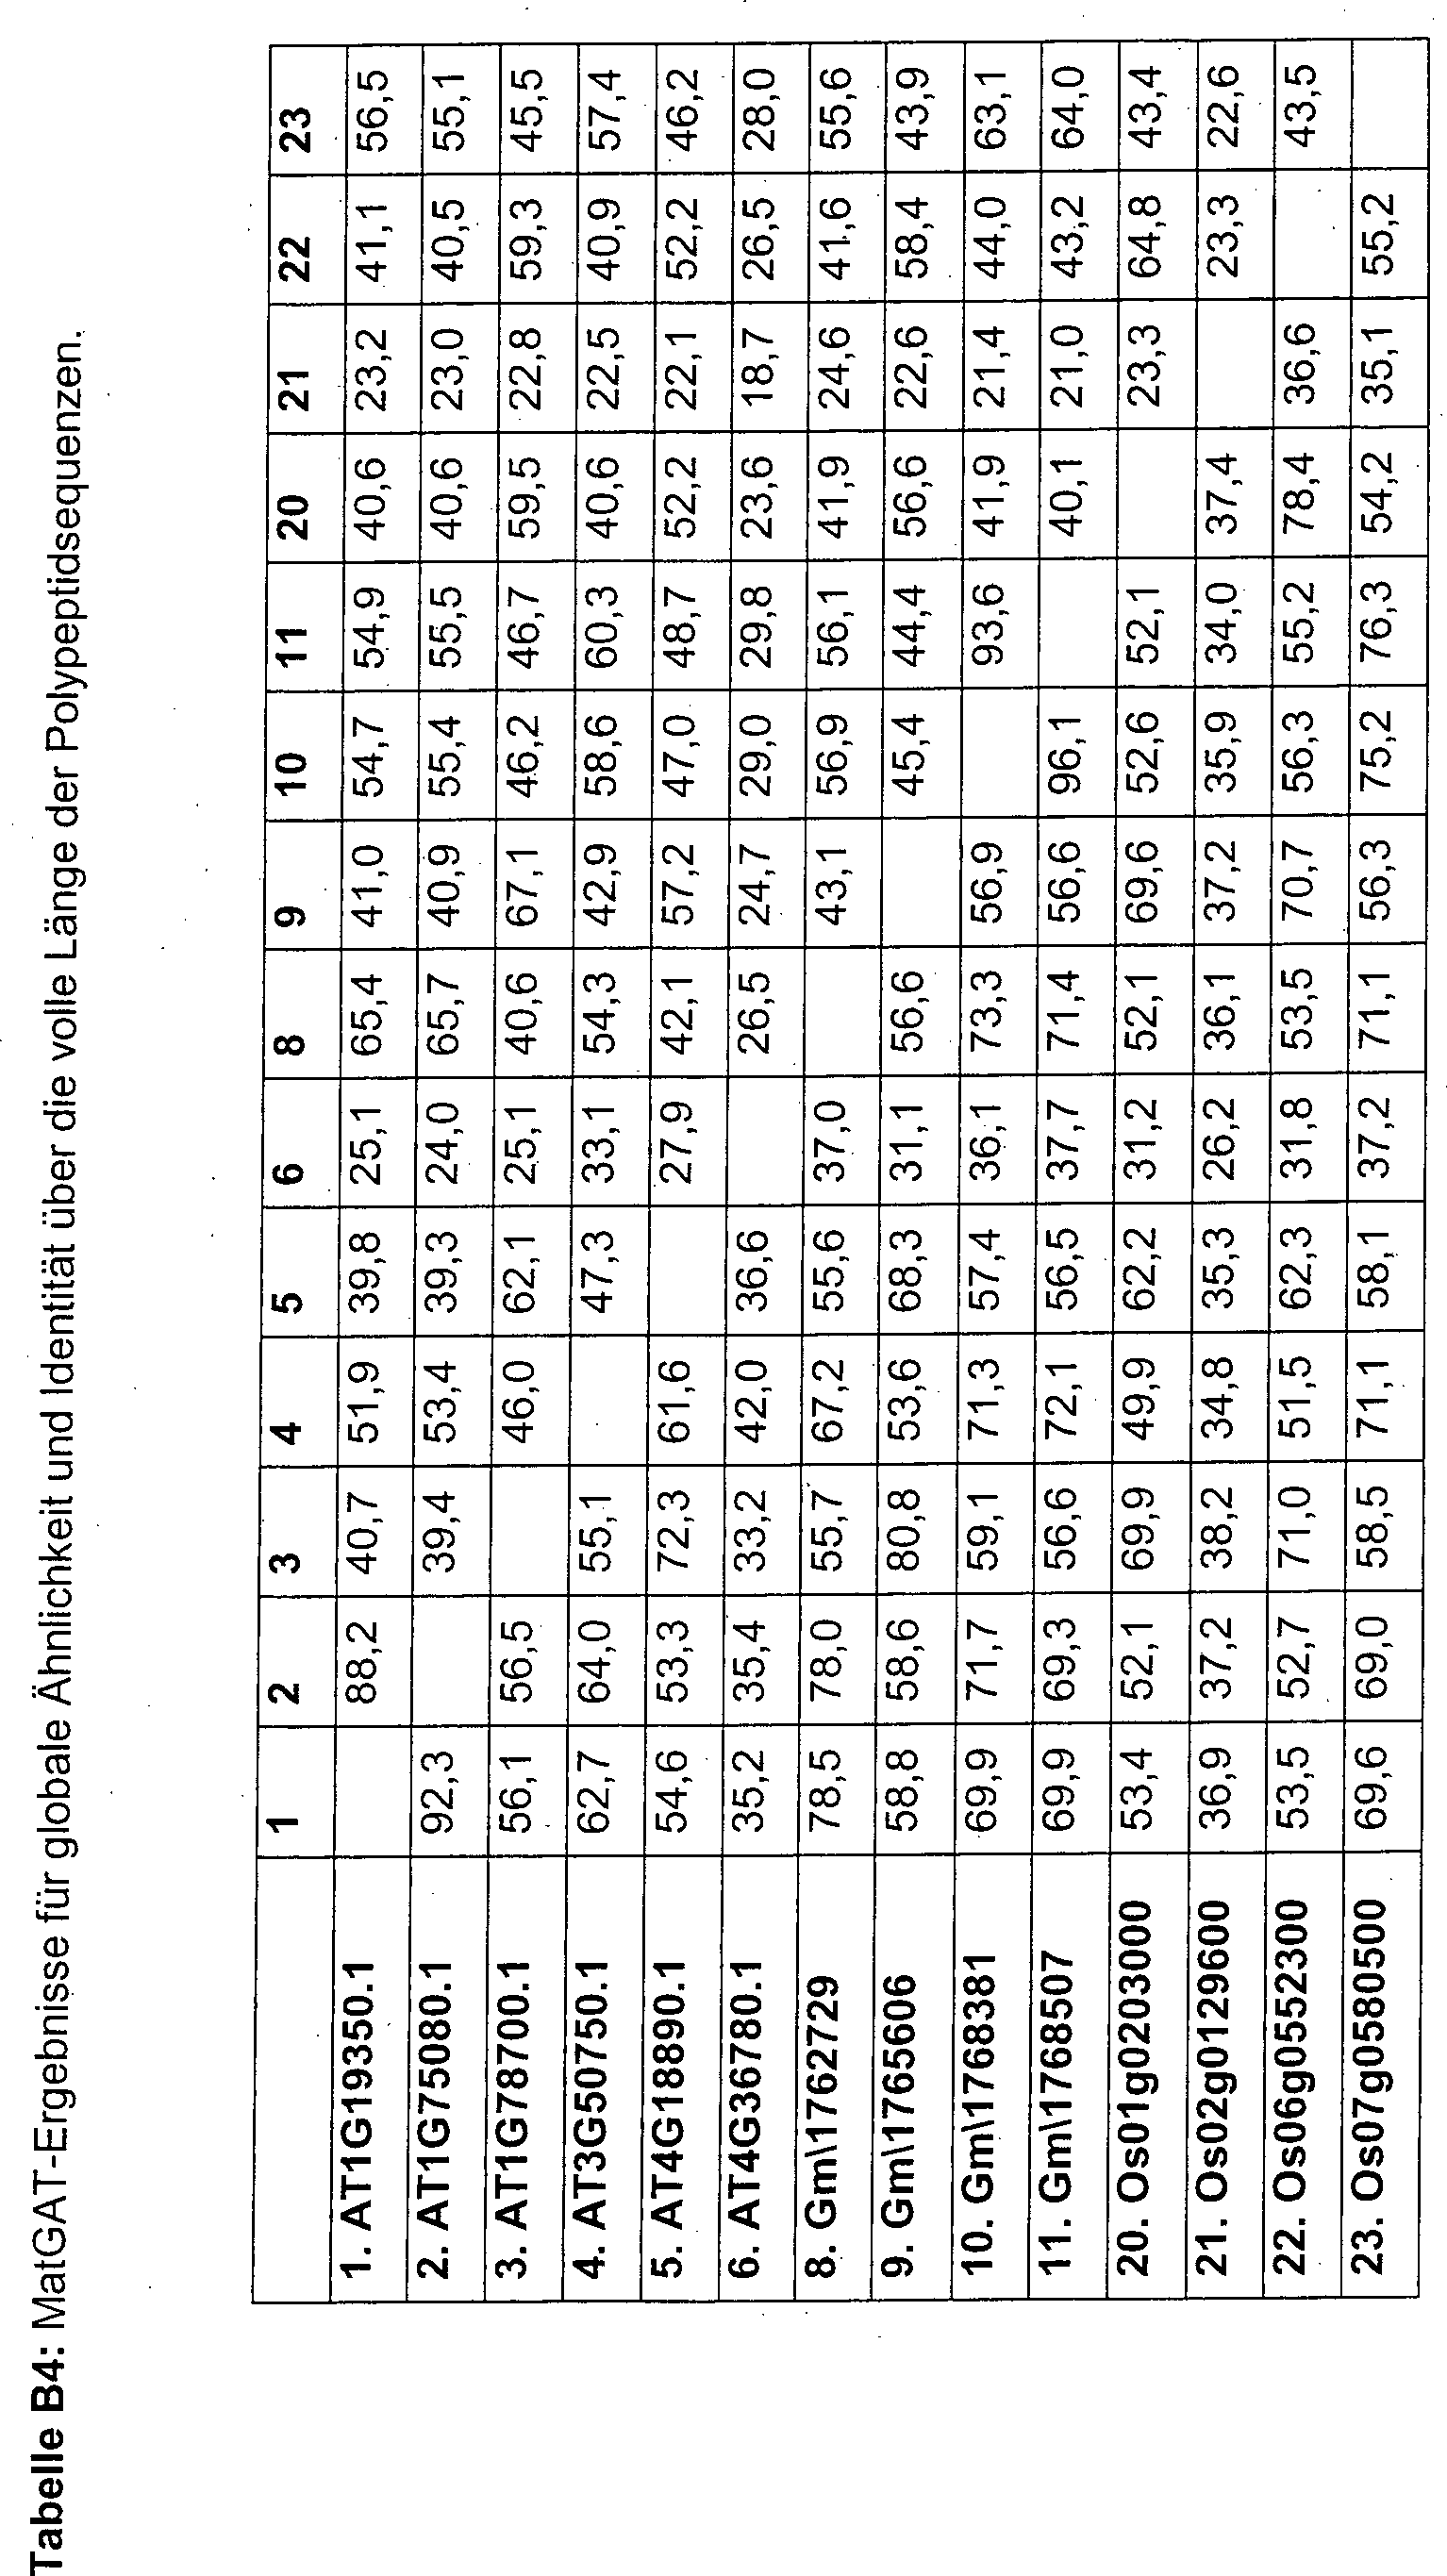 prostata dimensioni dt 5. 2 cm dap 36 5 cm 2